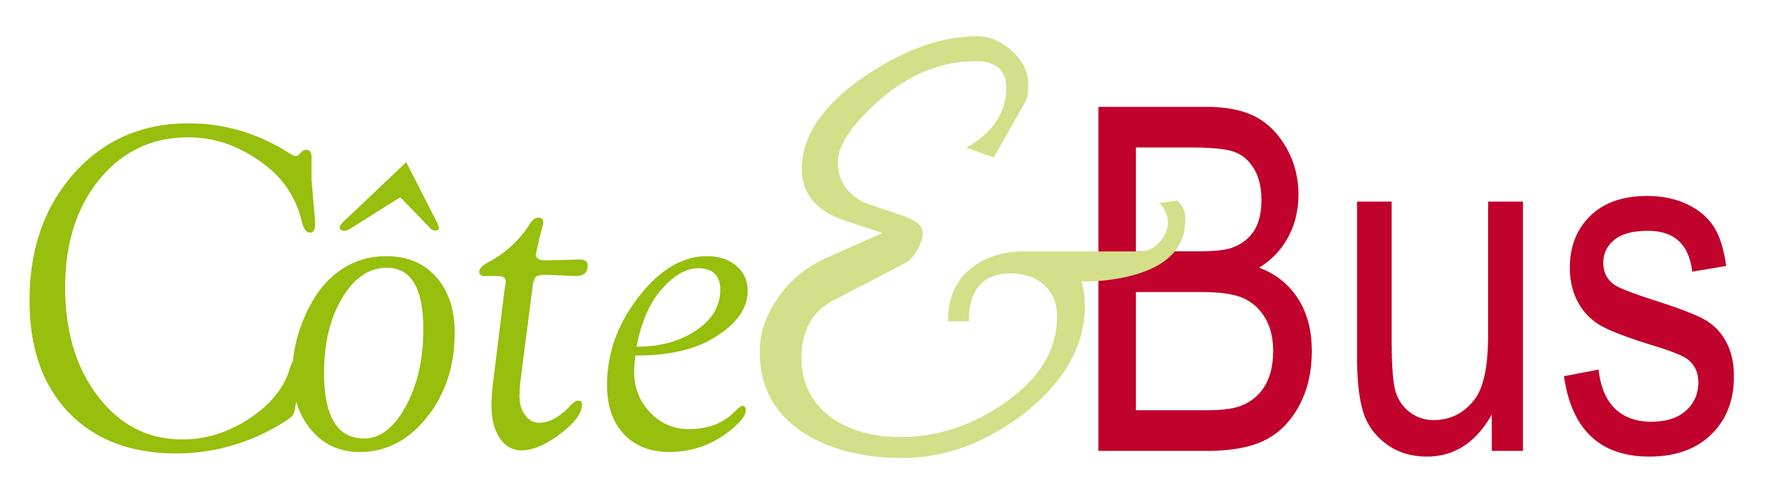 logo_cote_et_bus.jpg